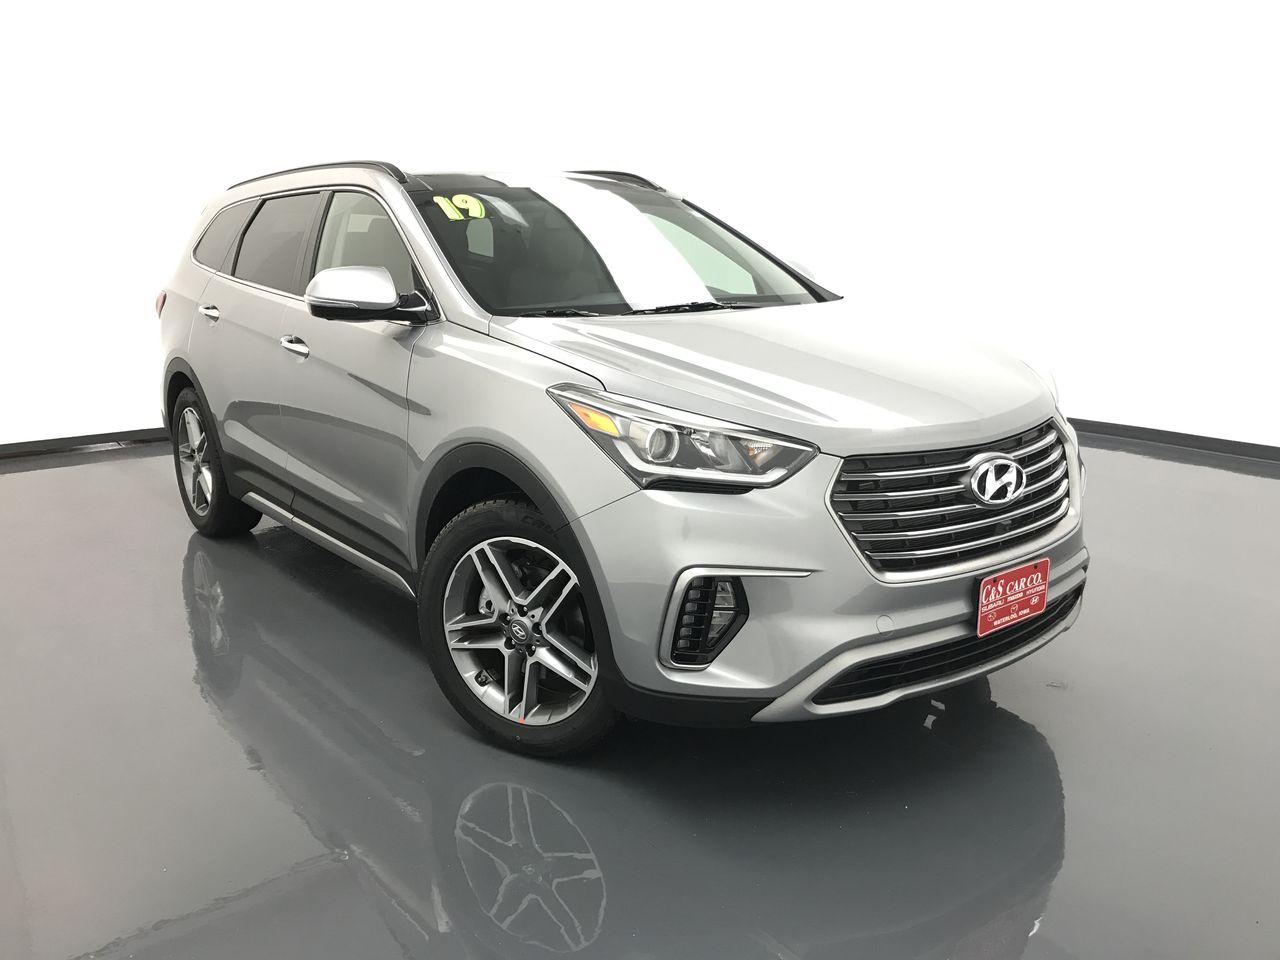 Thumbnail 2019 Hyundai Santa Fe Xl C S Car Company